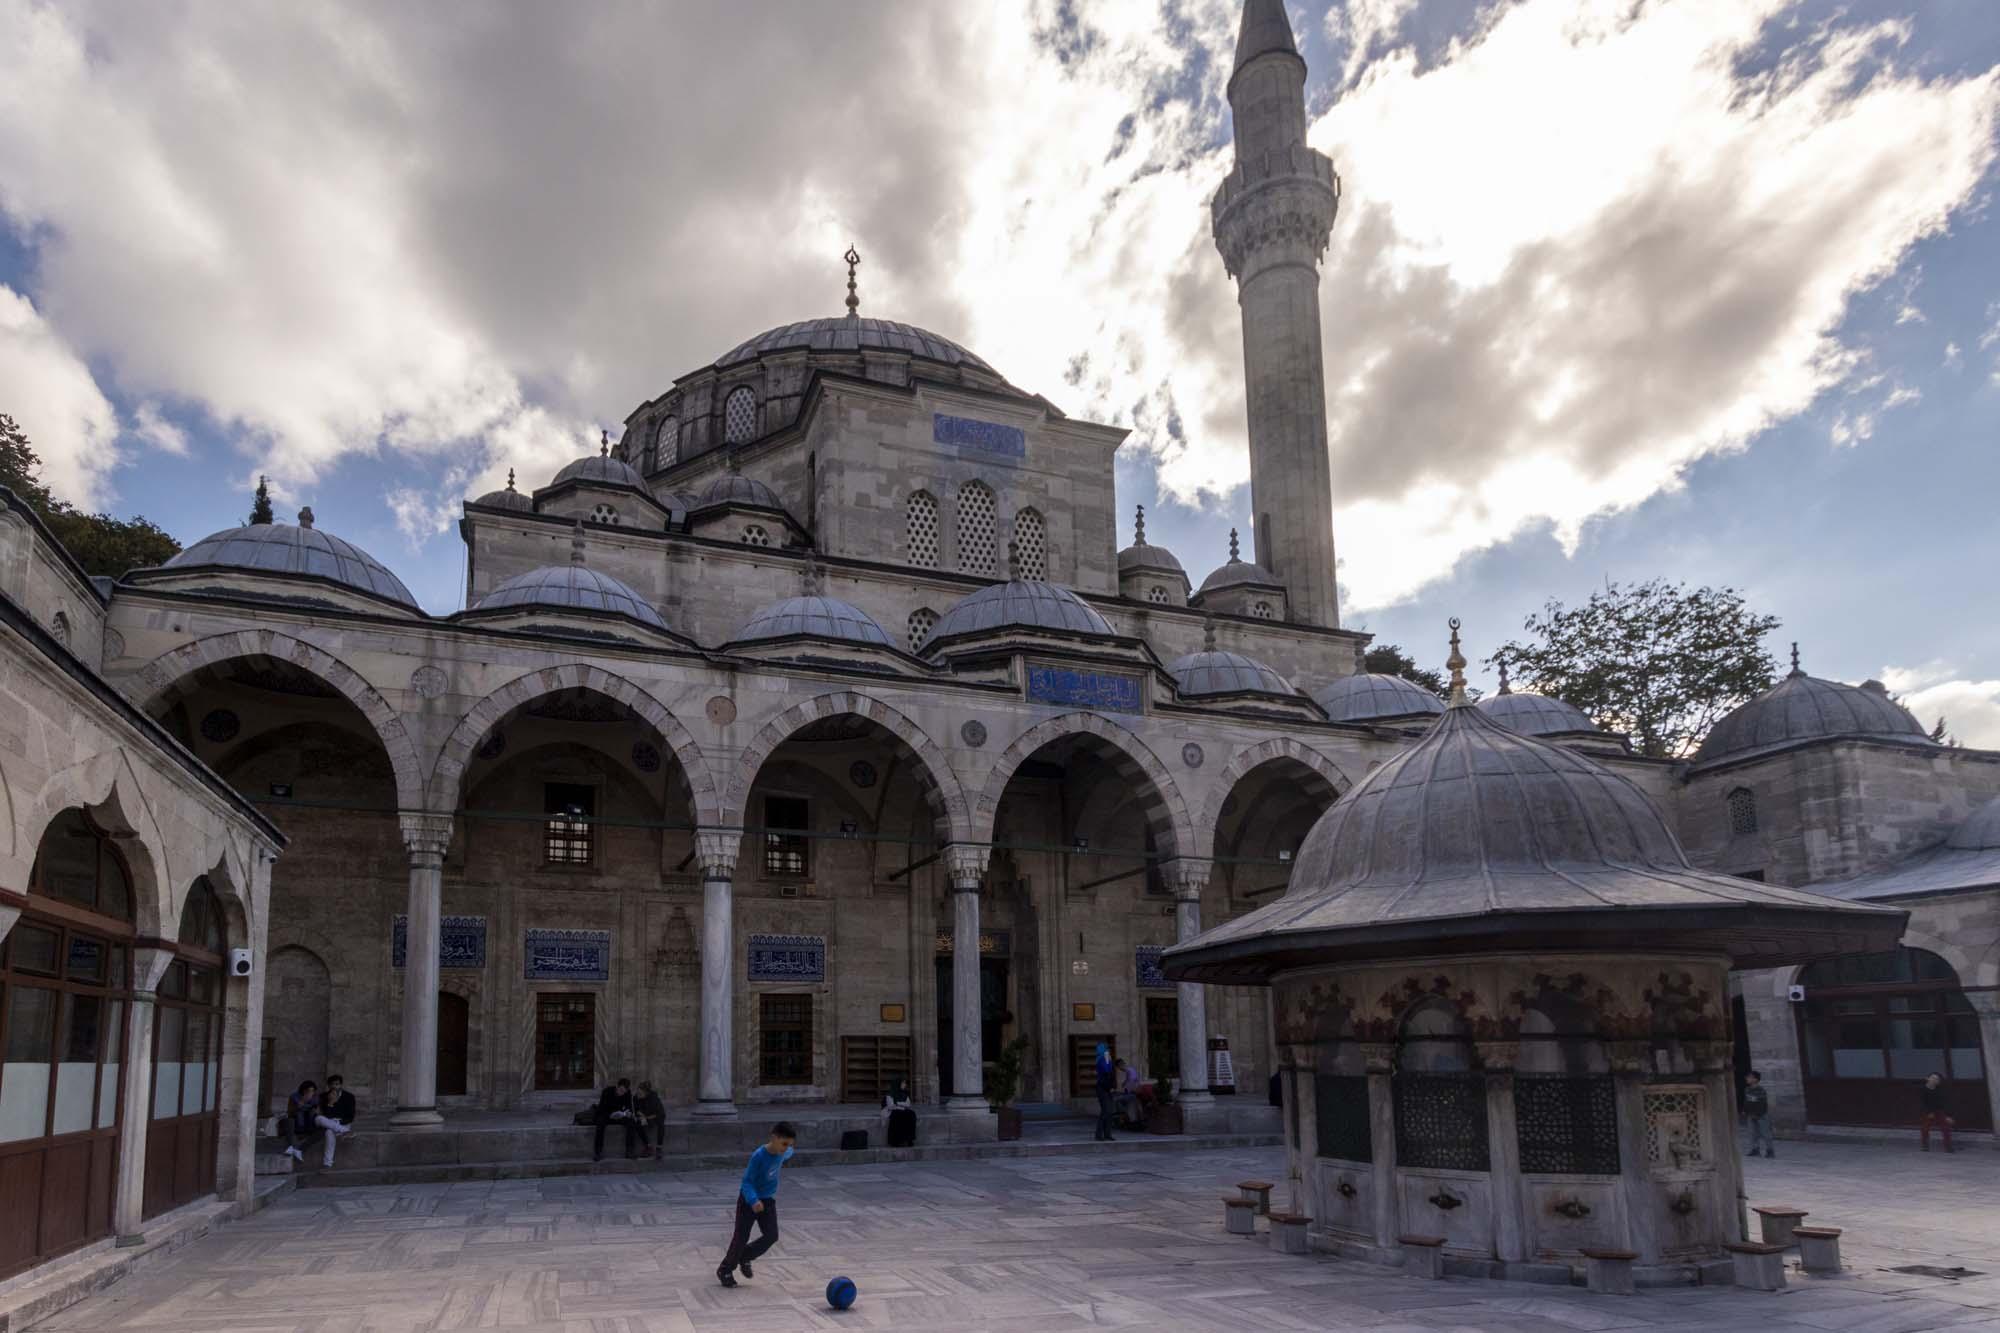 Sokollu Mehmet Paşa Camii dans la ville d'İstanbul en Turquie